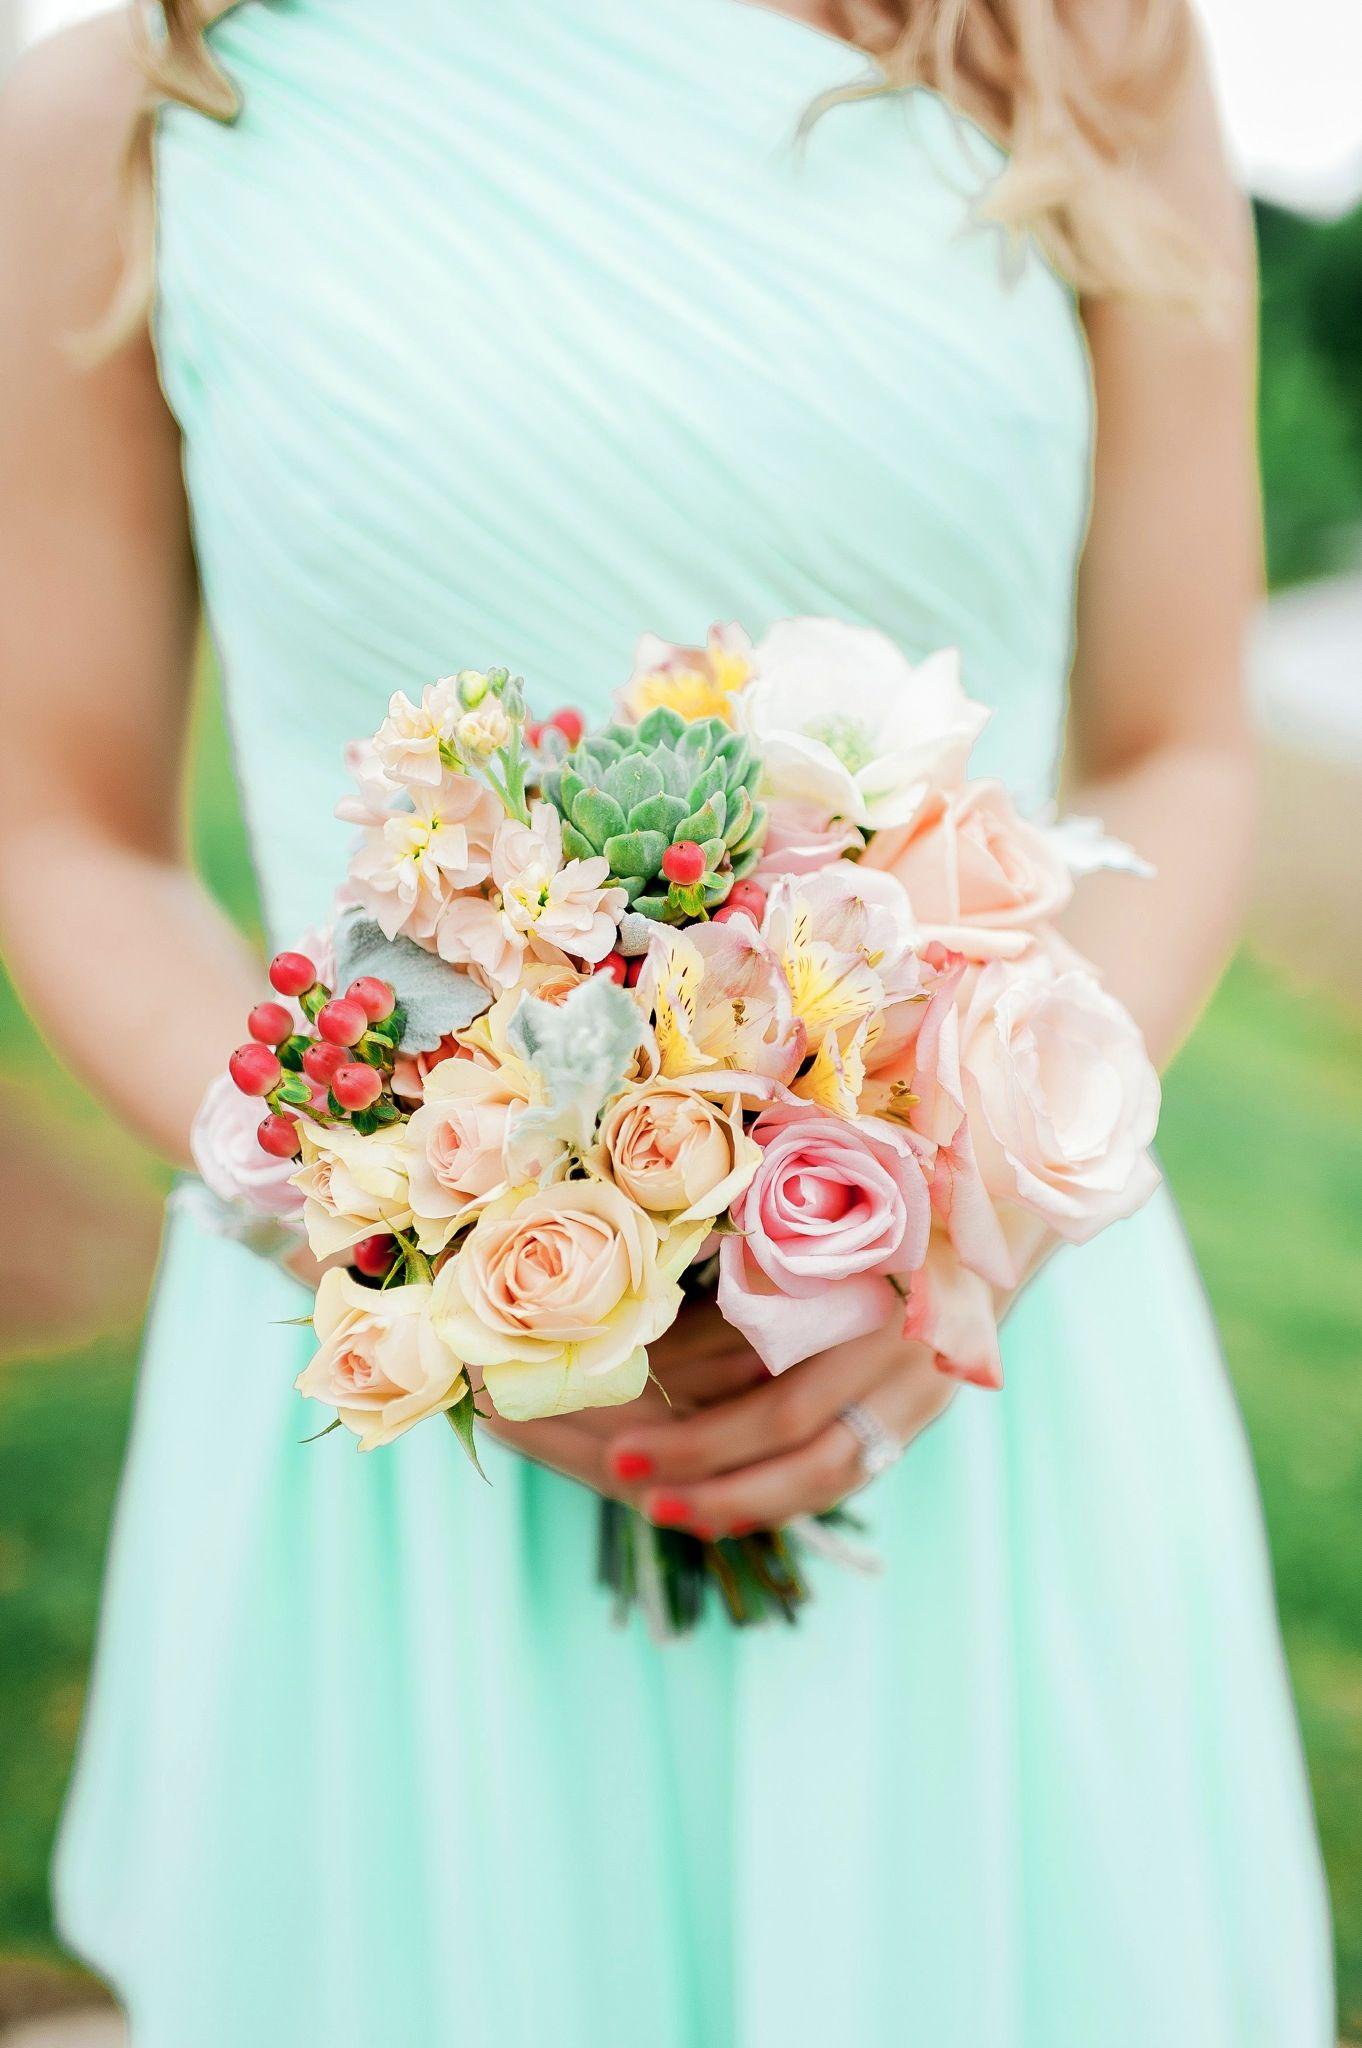 Chelsea's Bridesmaids                   Photo by AlexGrace Photography